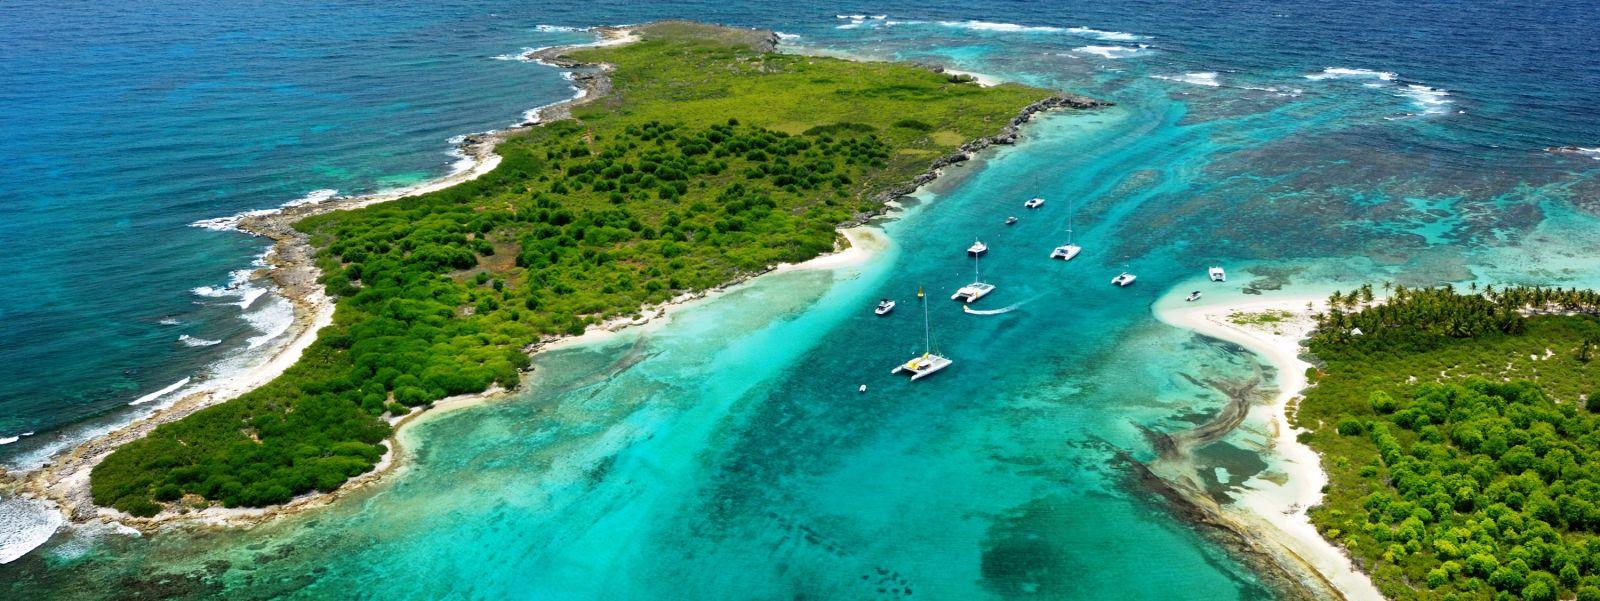 guadeloupe.Гваделупа - остров в форме бабочки. Отдых на пляжах Индии